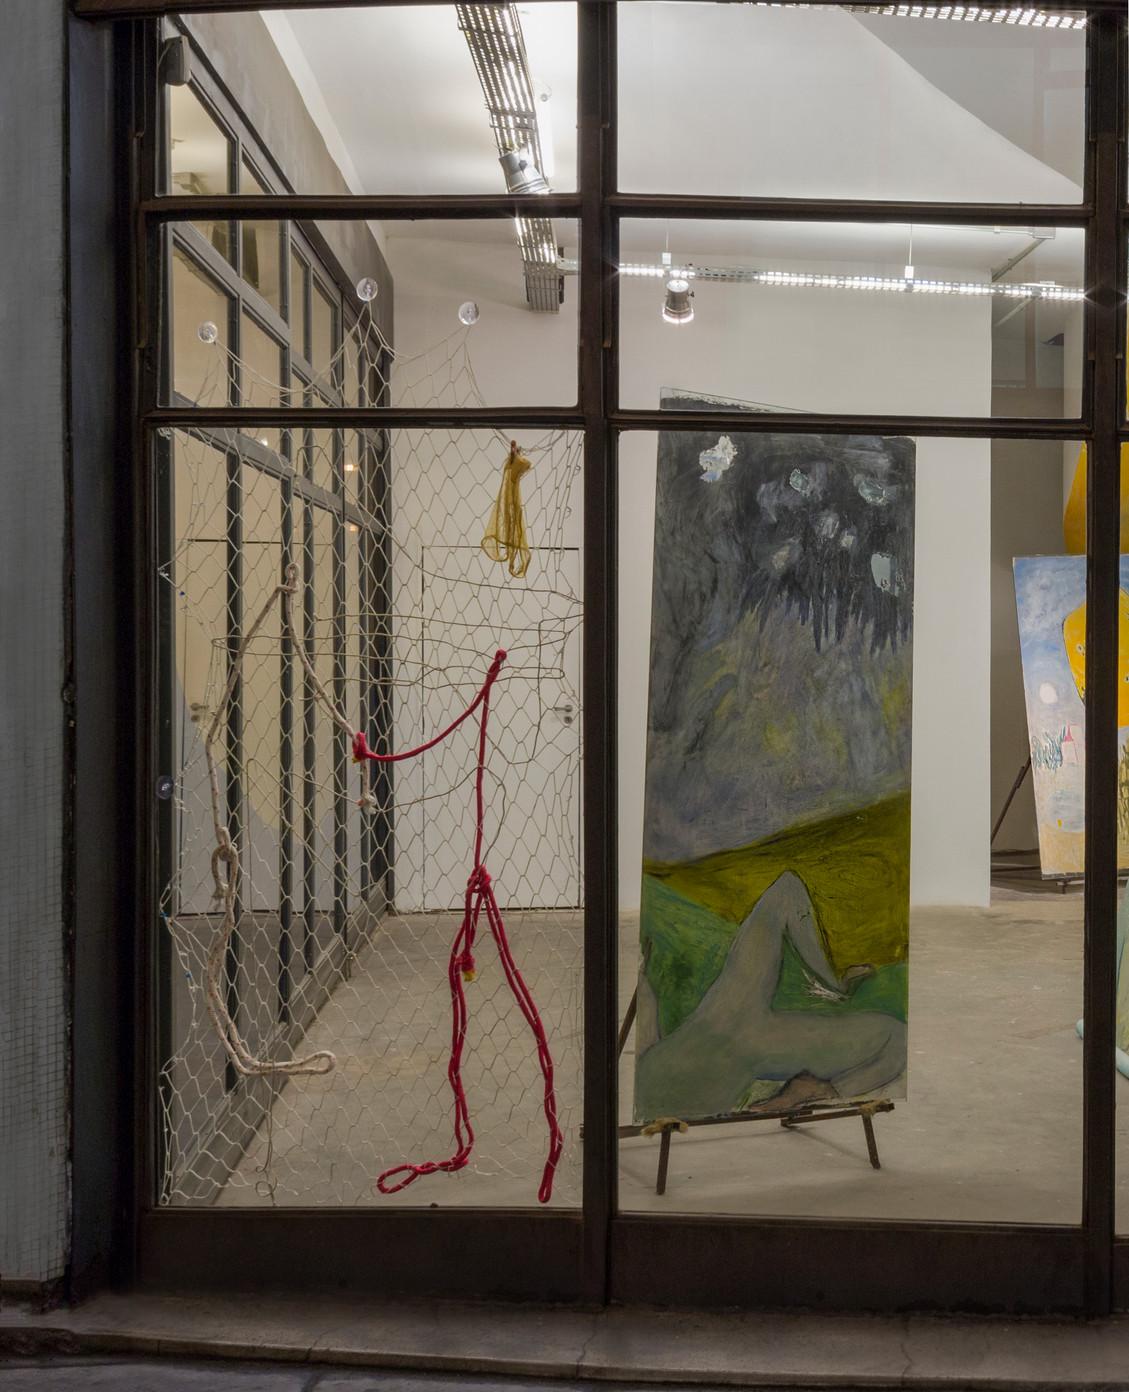 The tie, 2018 |  Nylon net, clothes and sisal | 183 x 108 cm